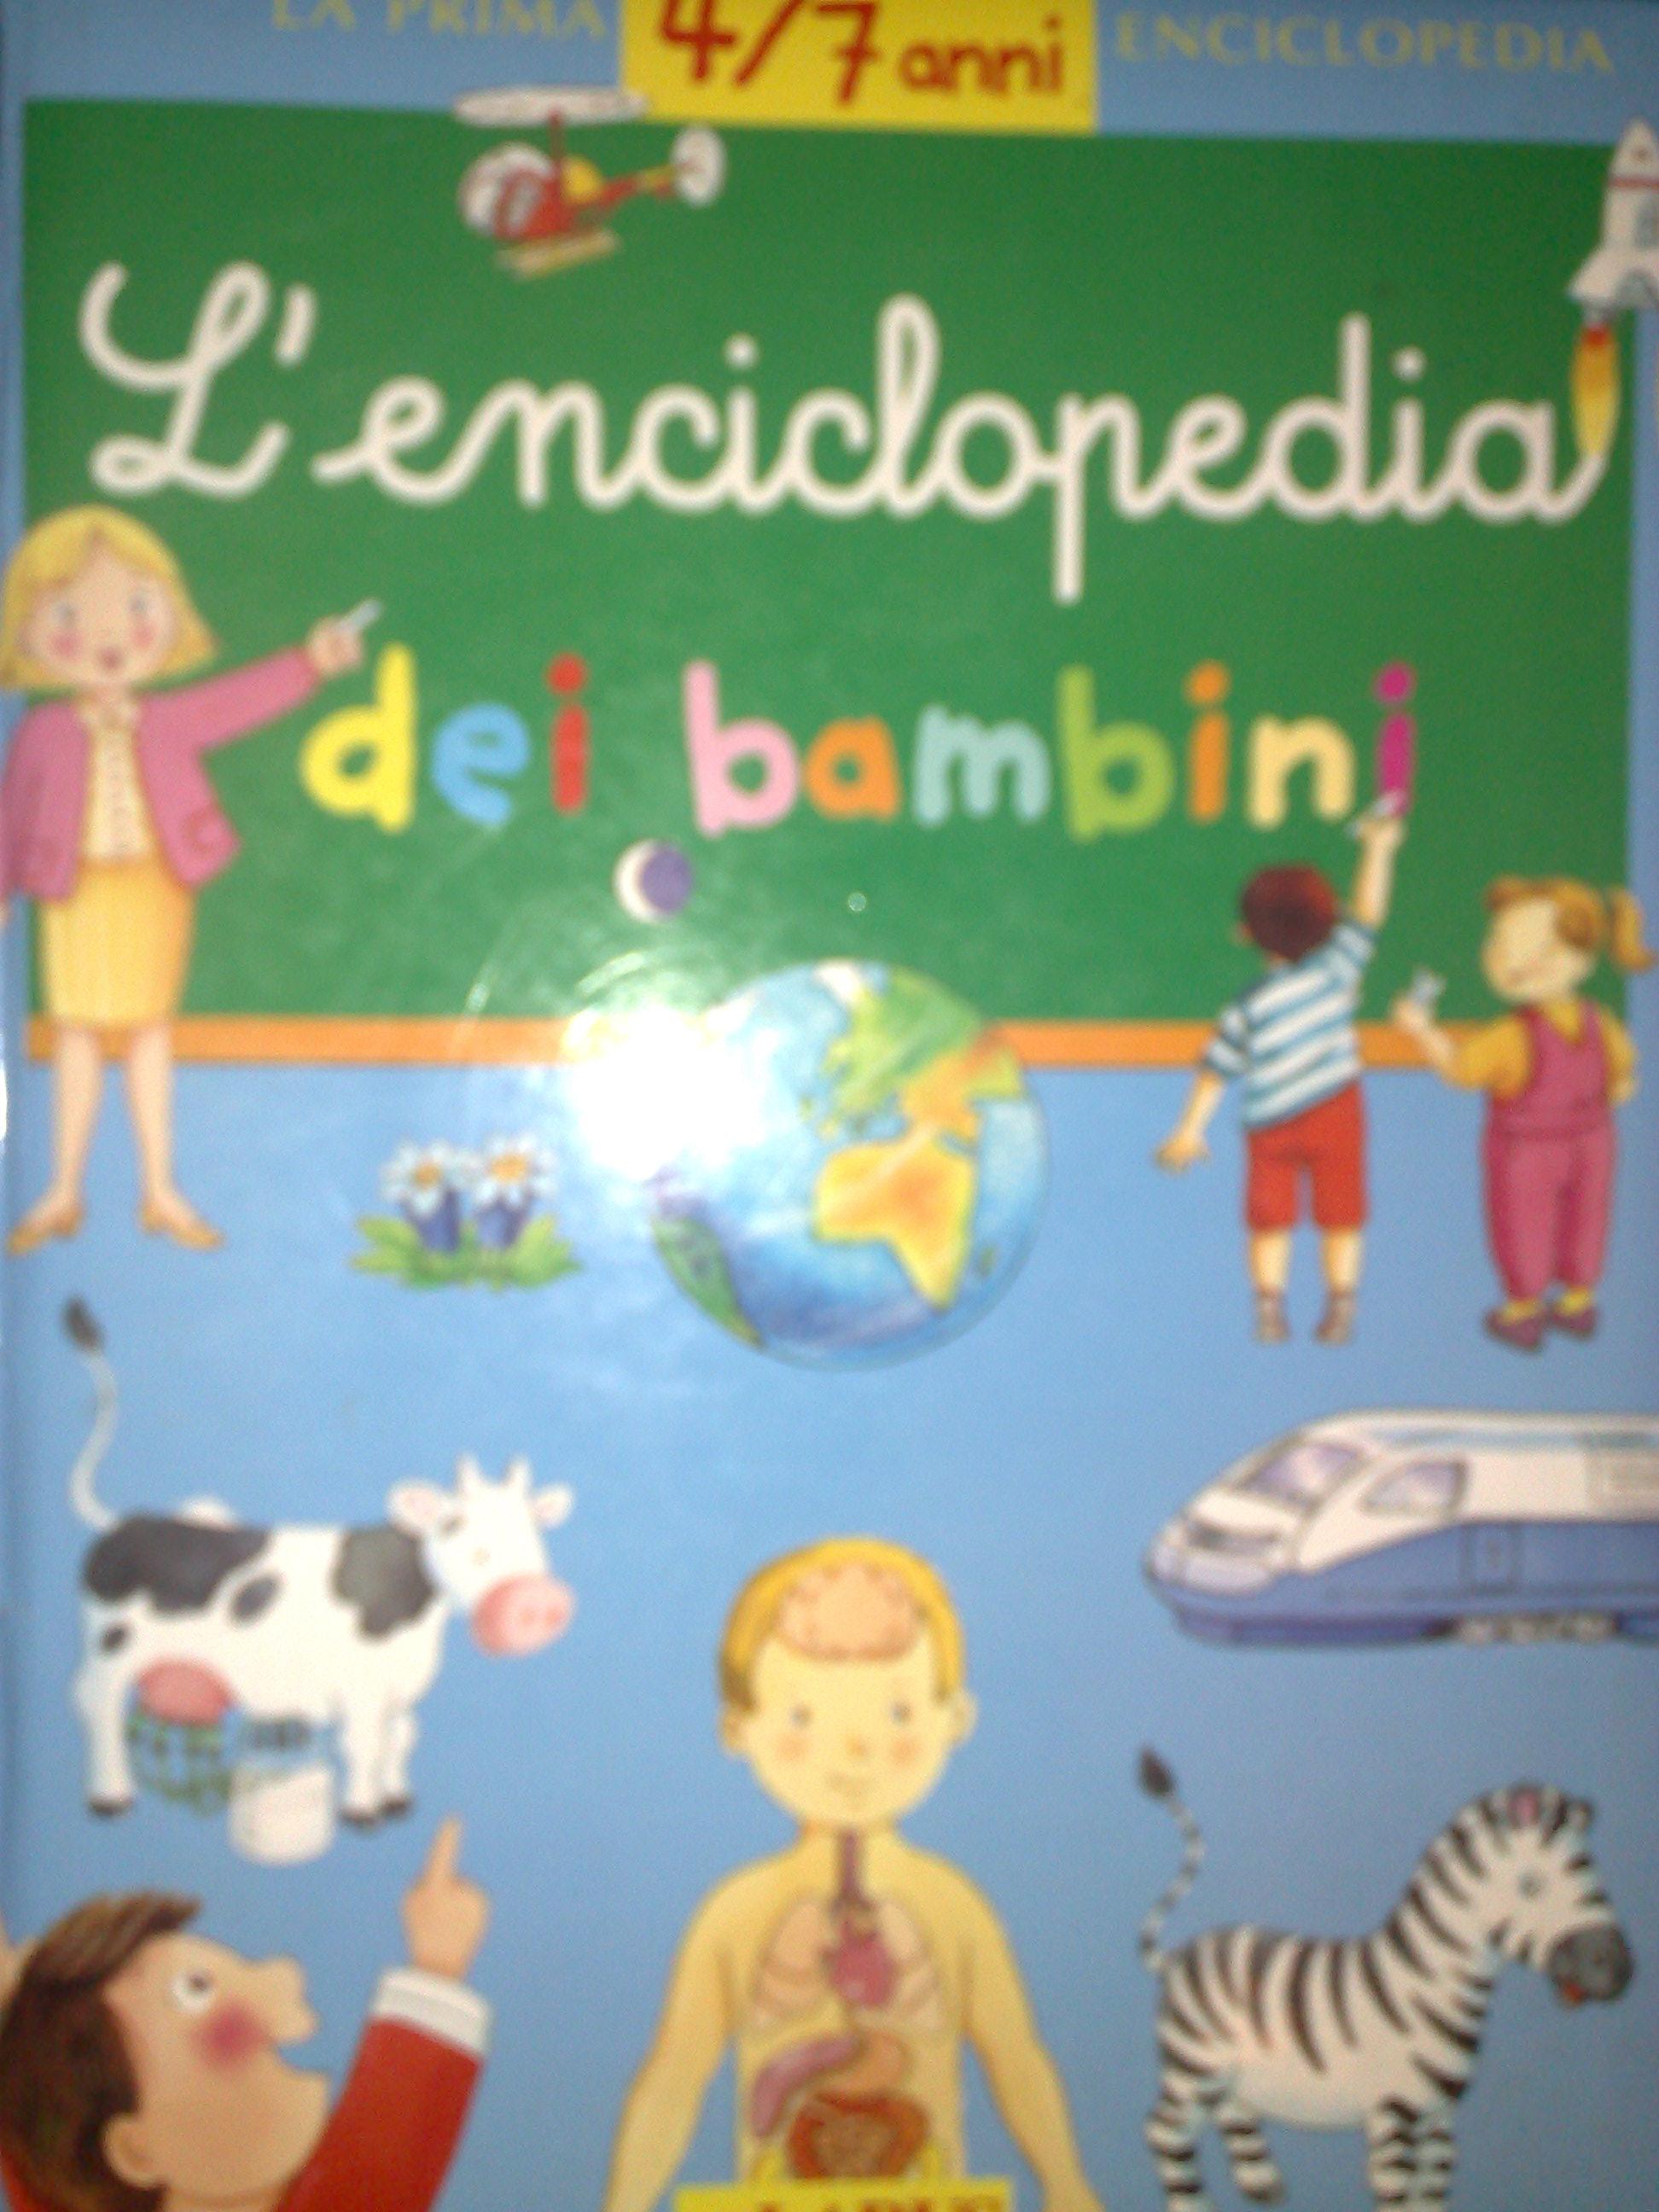 L' enciclopedia dei bambini